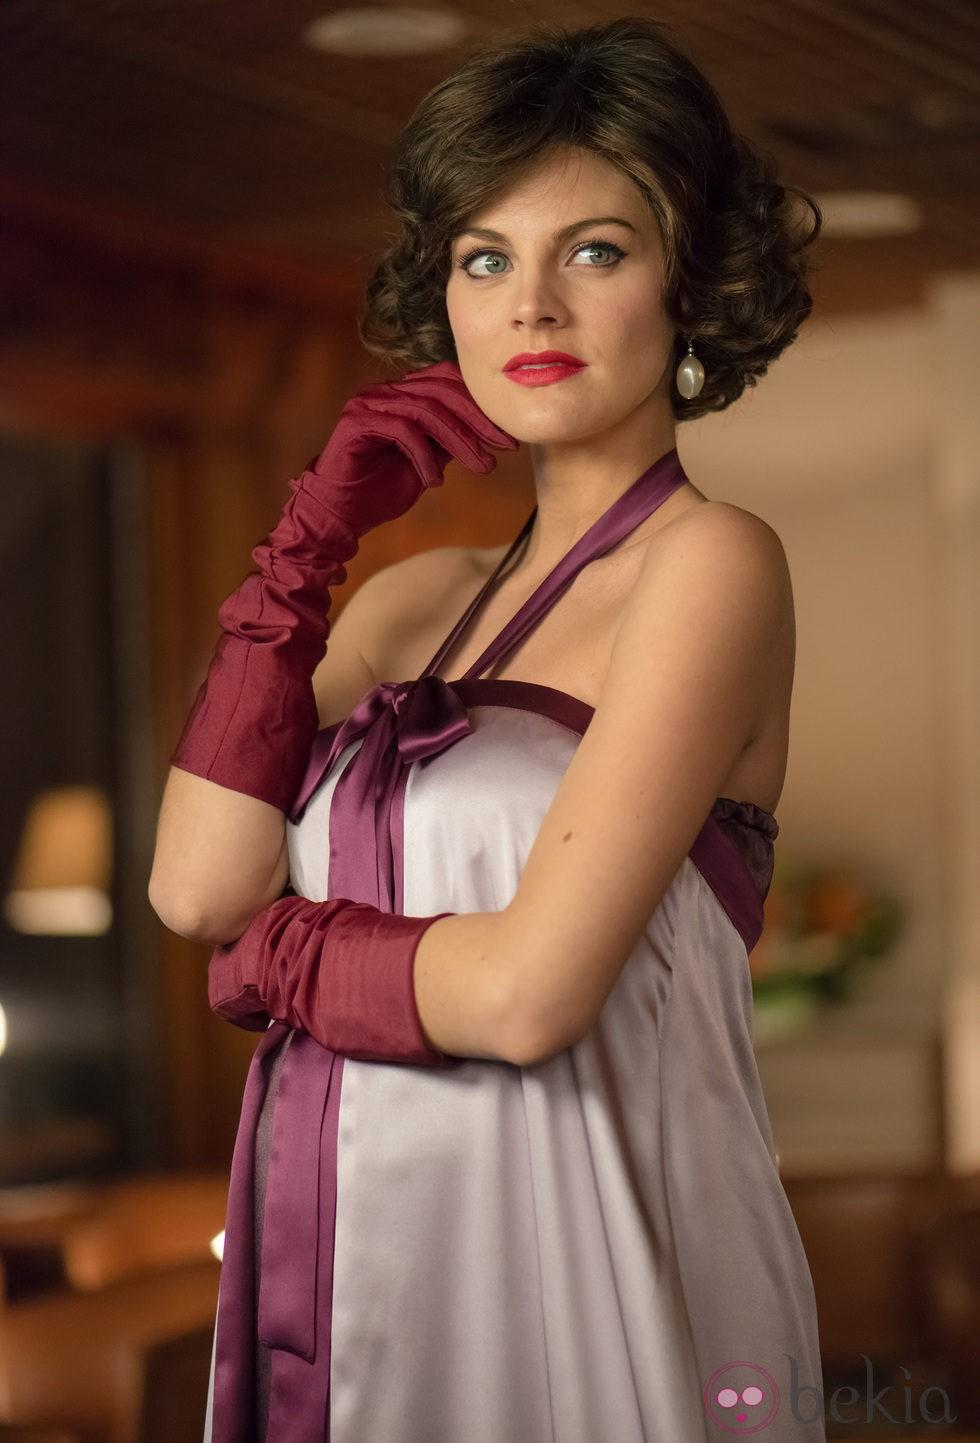 Primera imagen de Amaia Salamanca en 'Velvet'